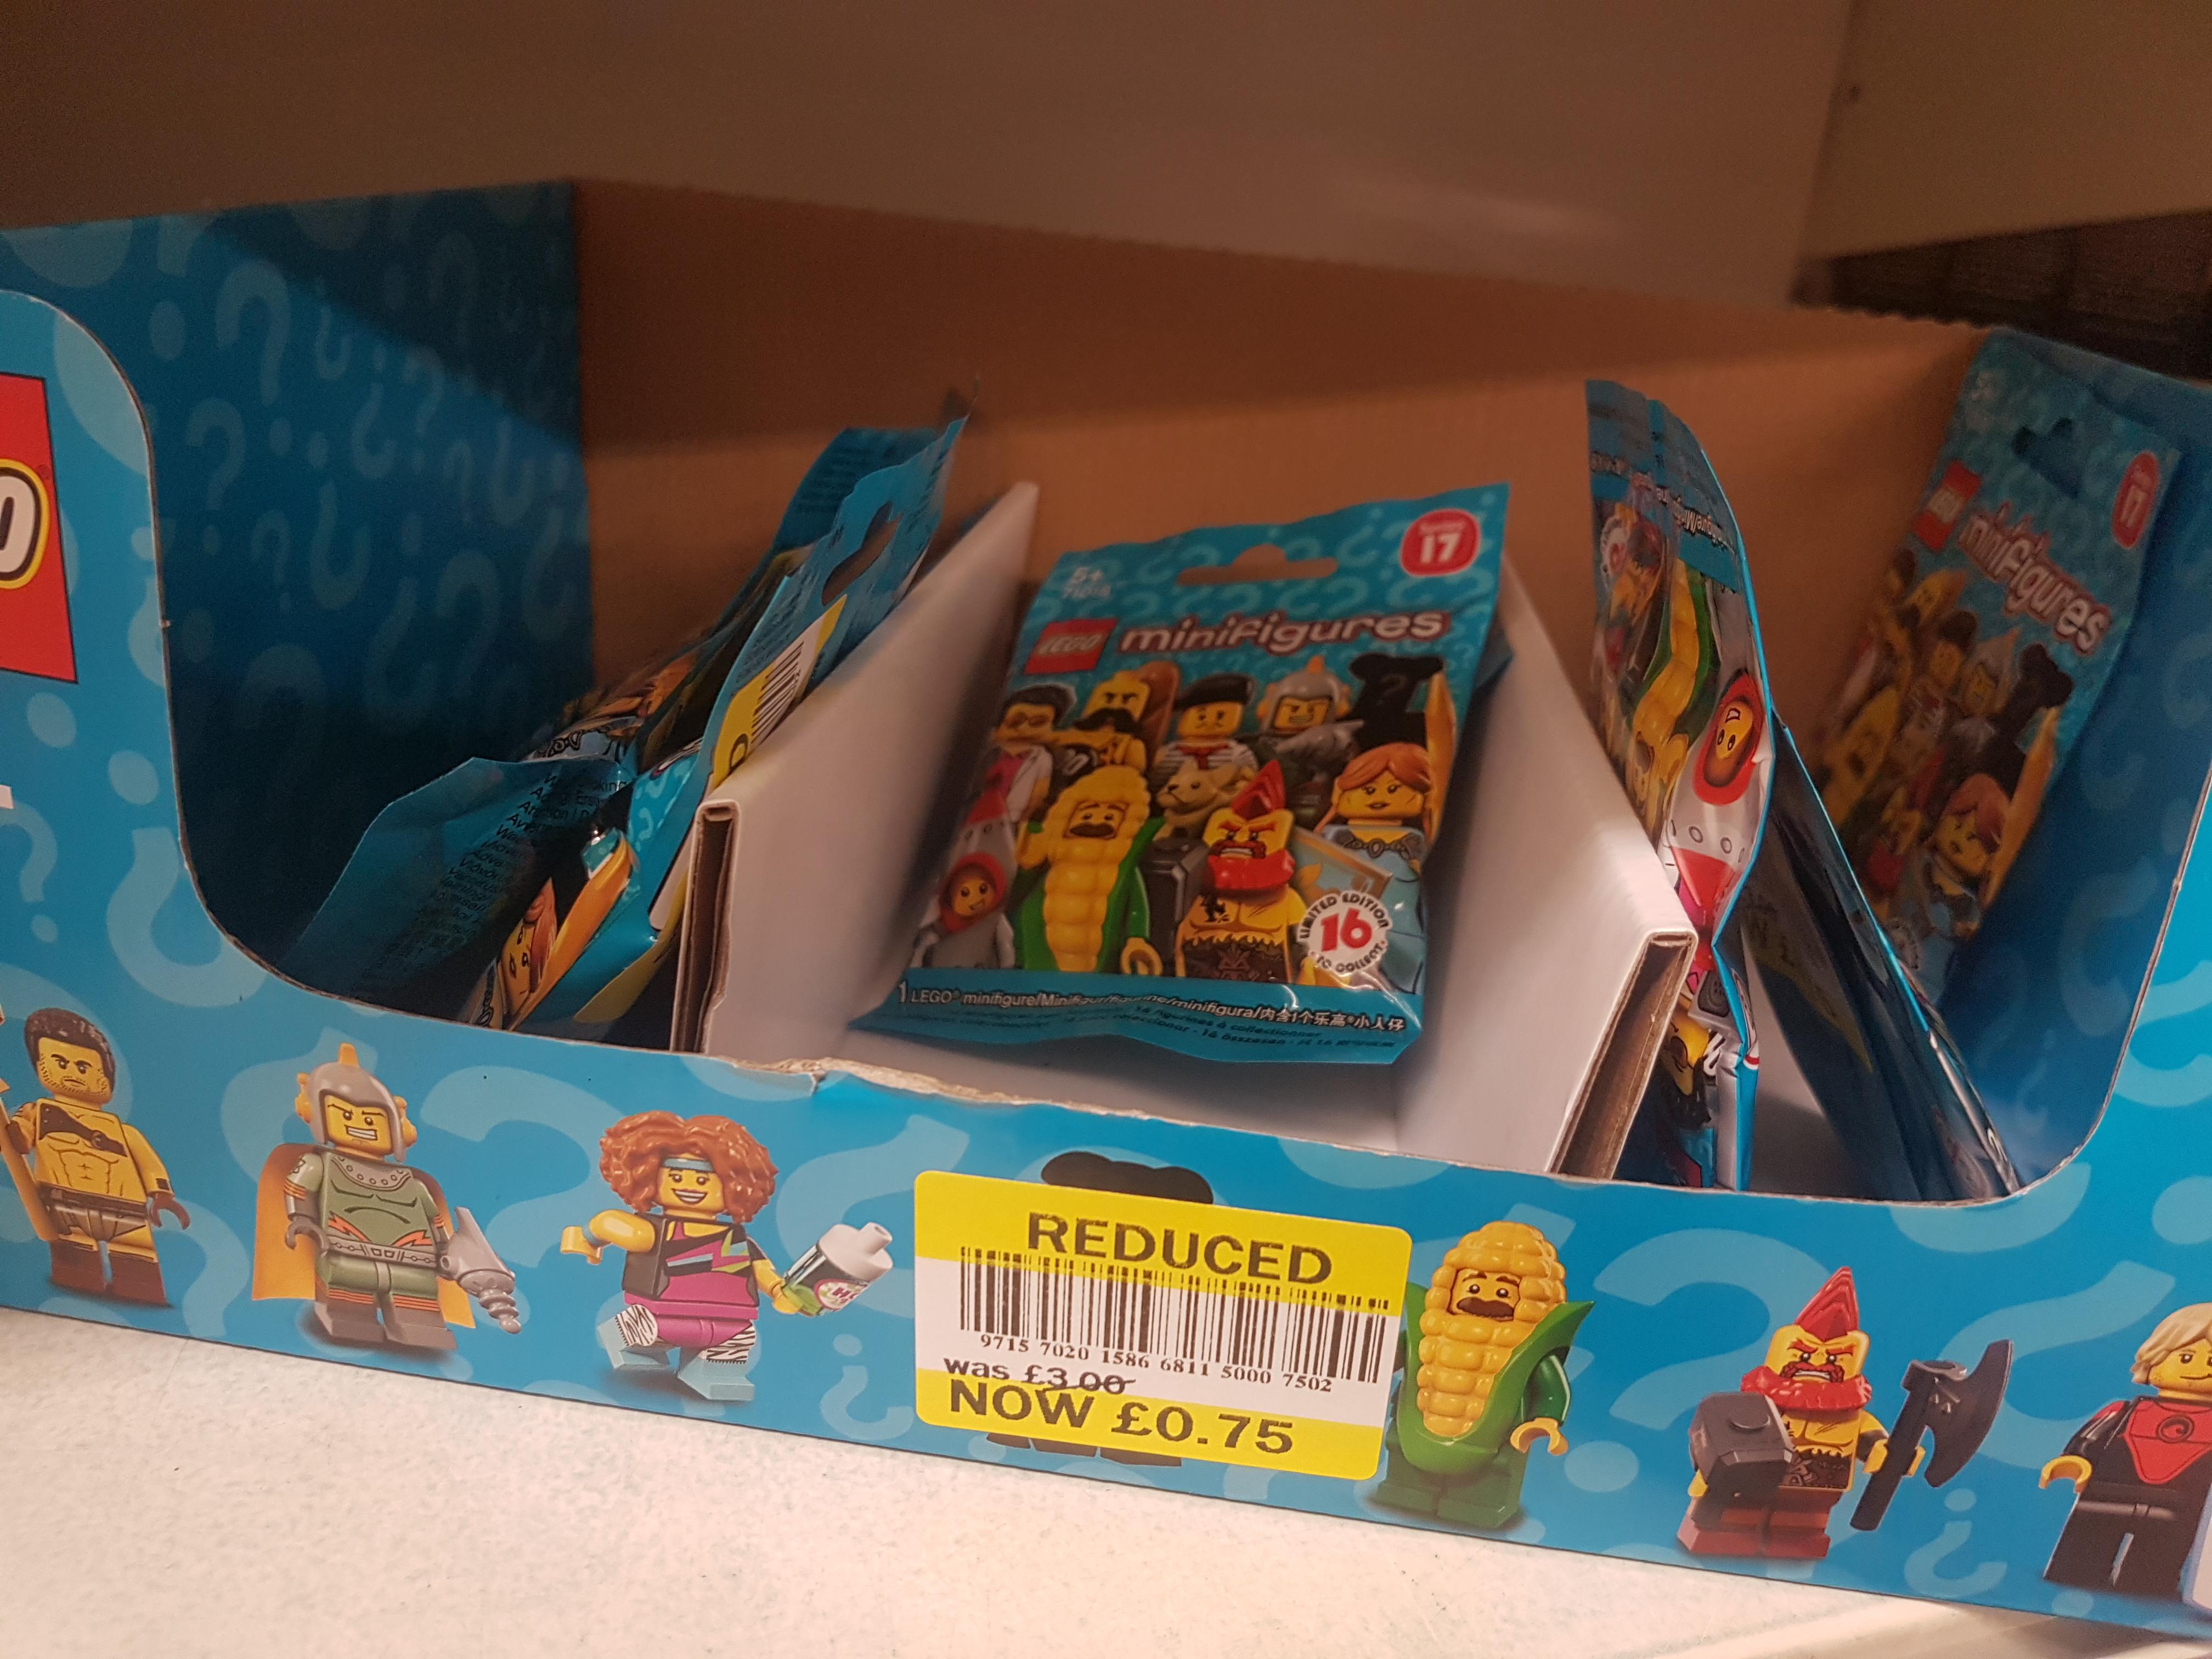 Lego minifigures series 17, 75p at Tesco Elmers End